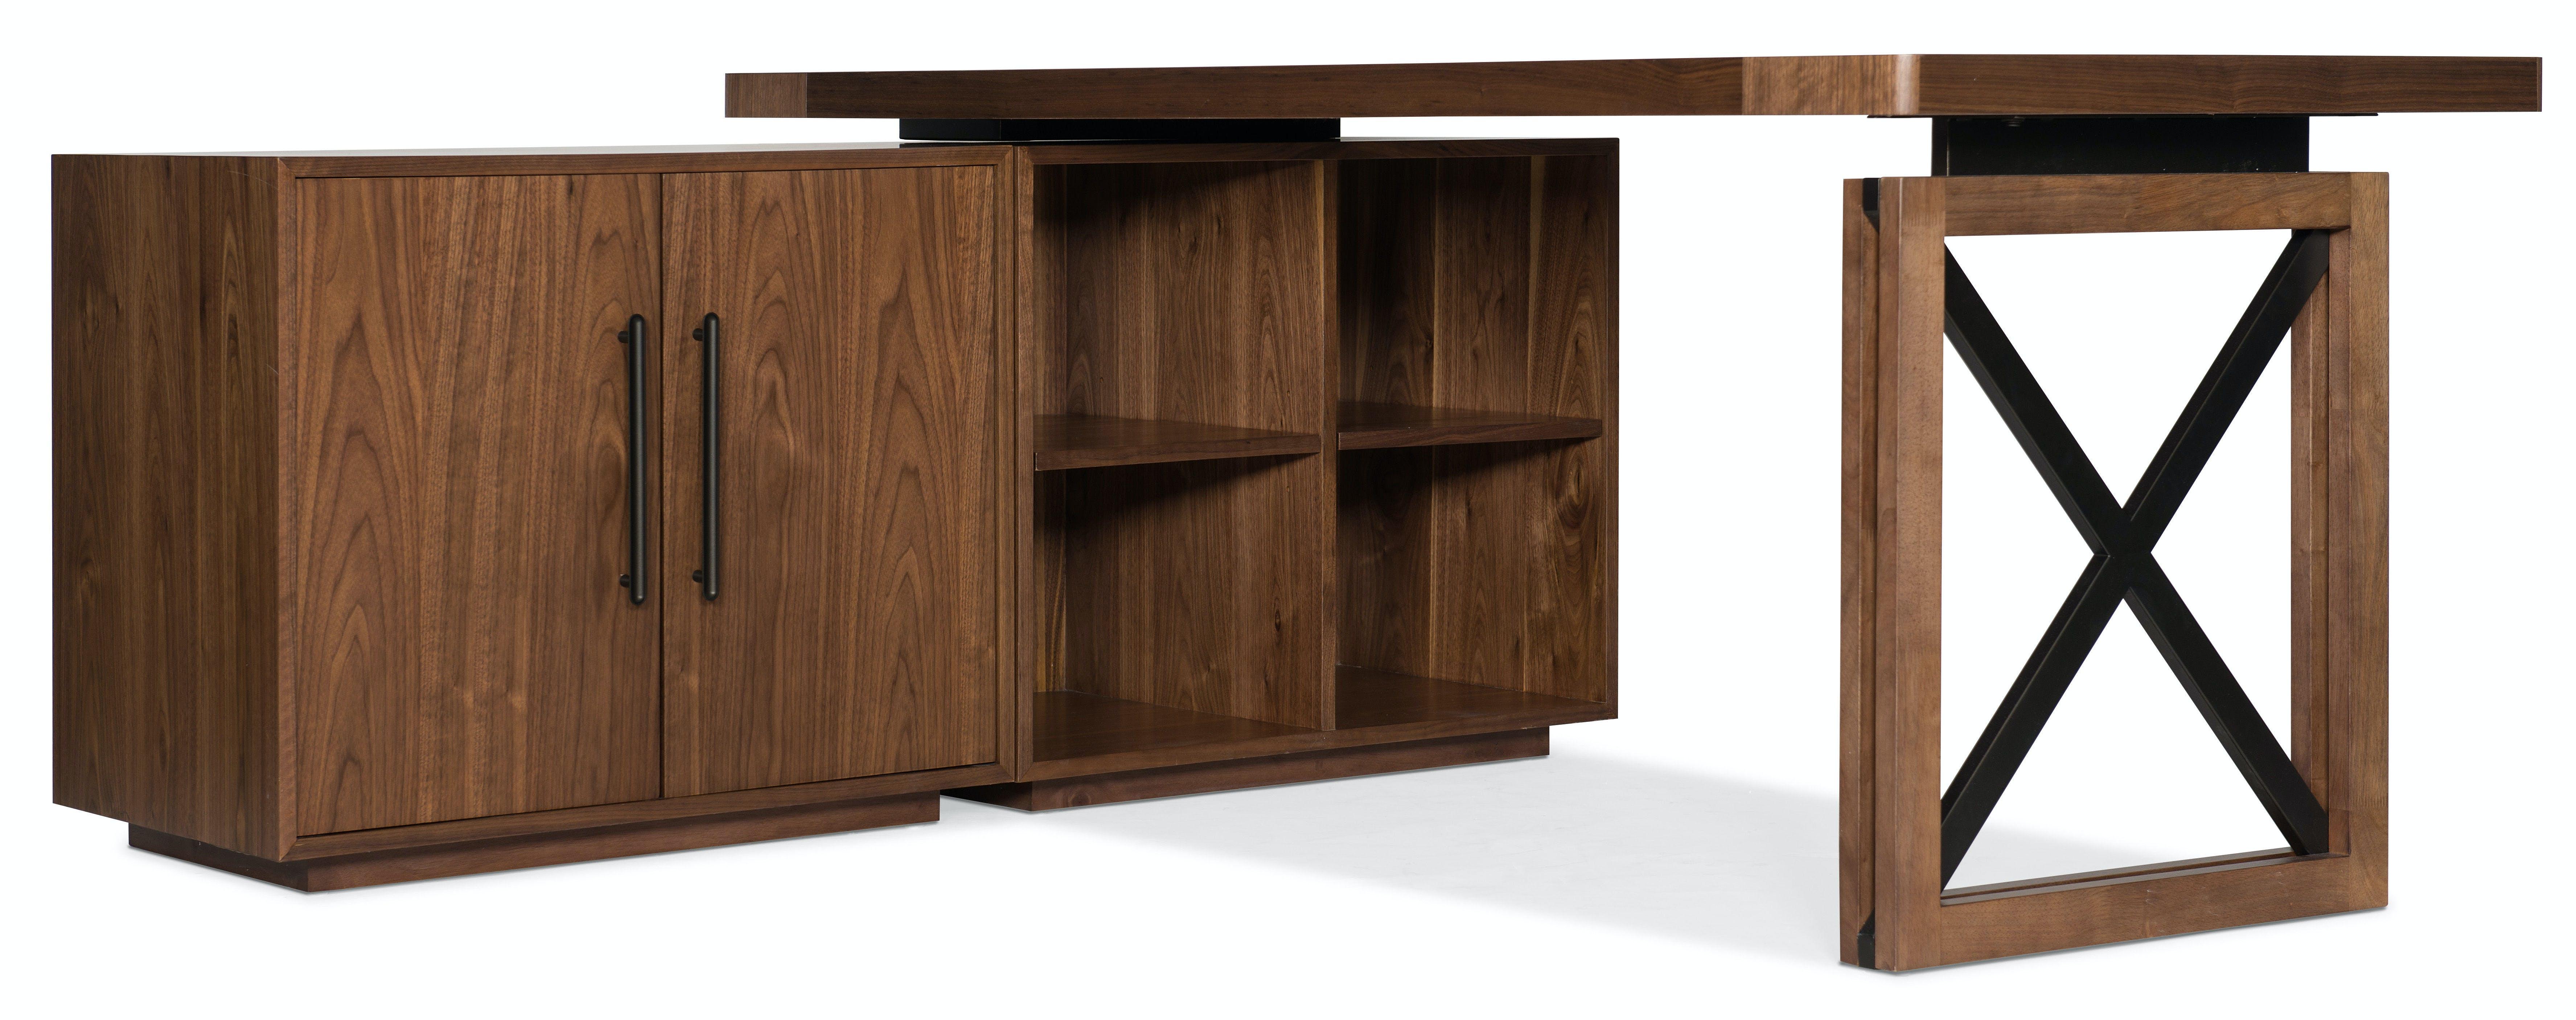 Hooker Furniture Home Office Elon Bunching Short Bookcase